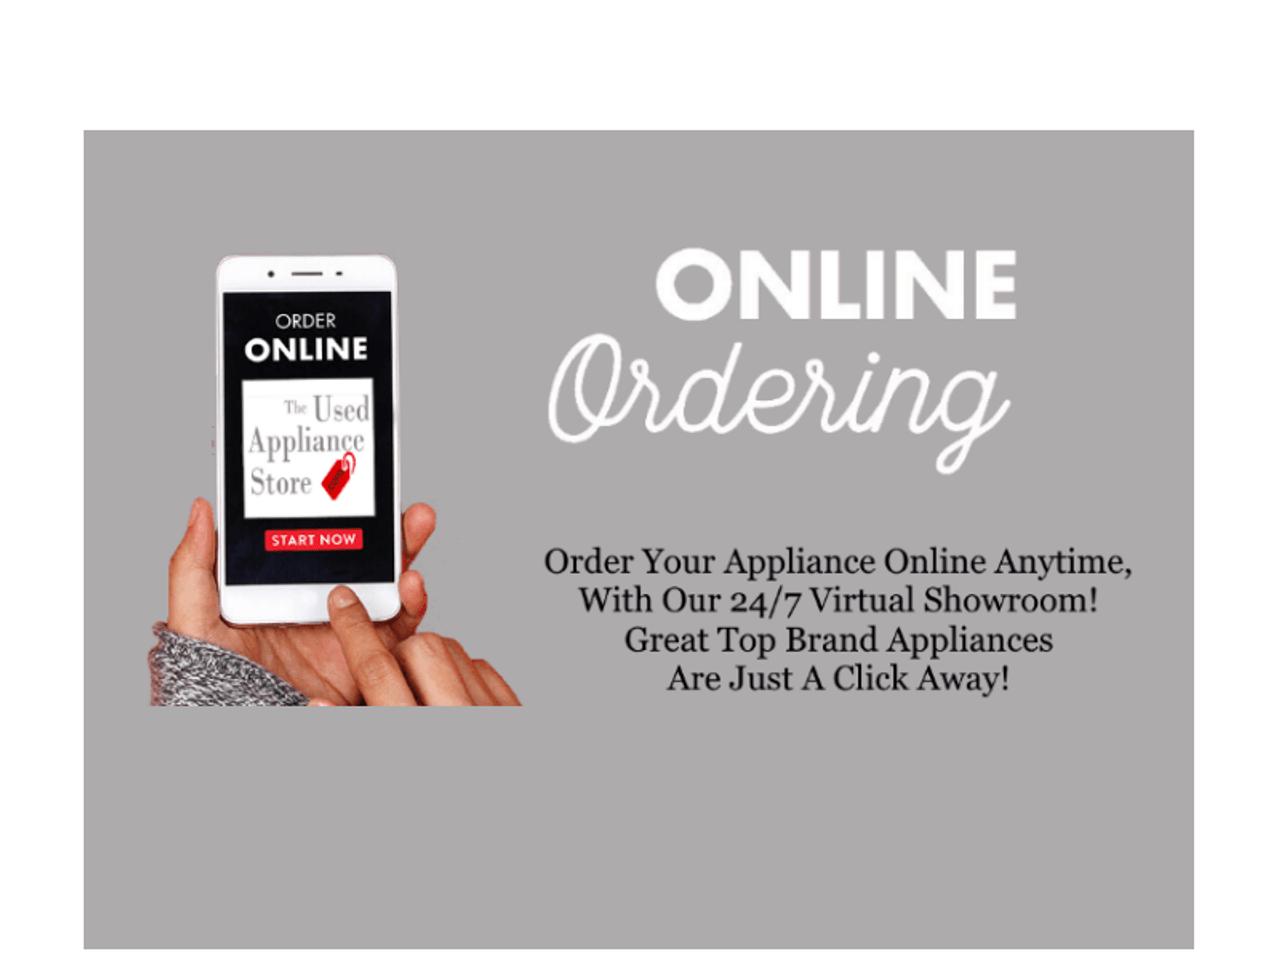 Order Appliances Online